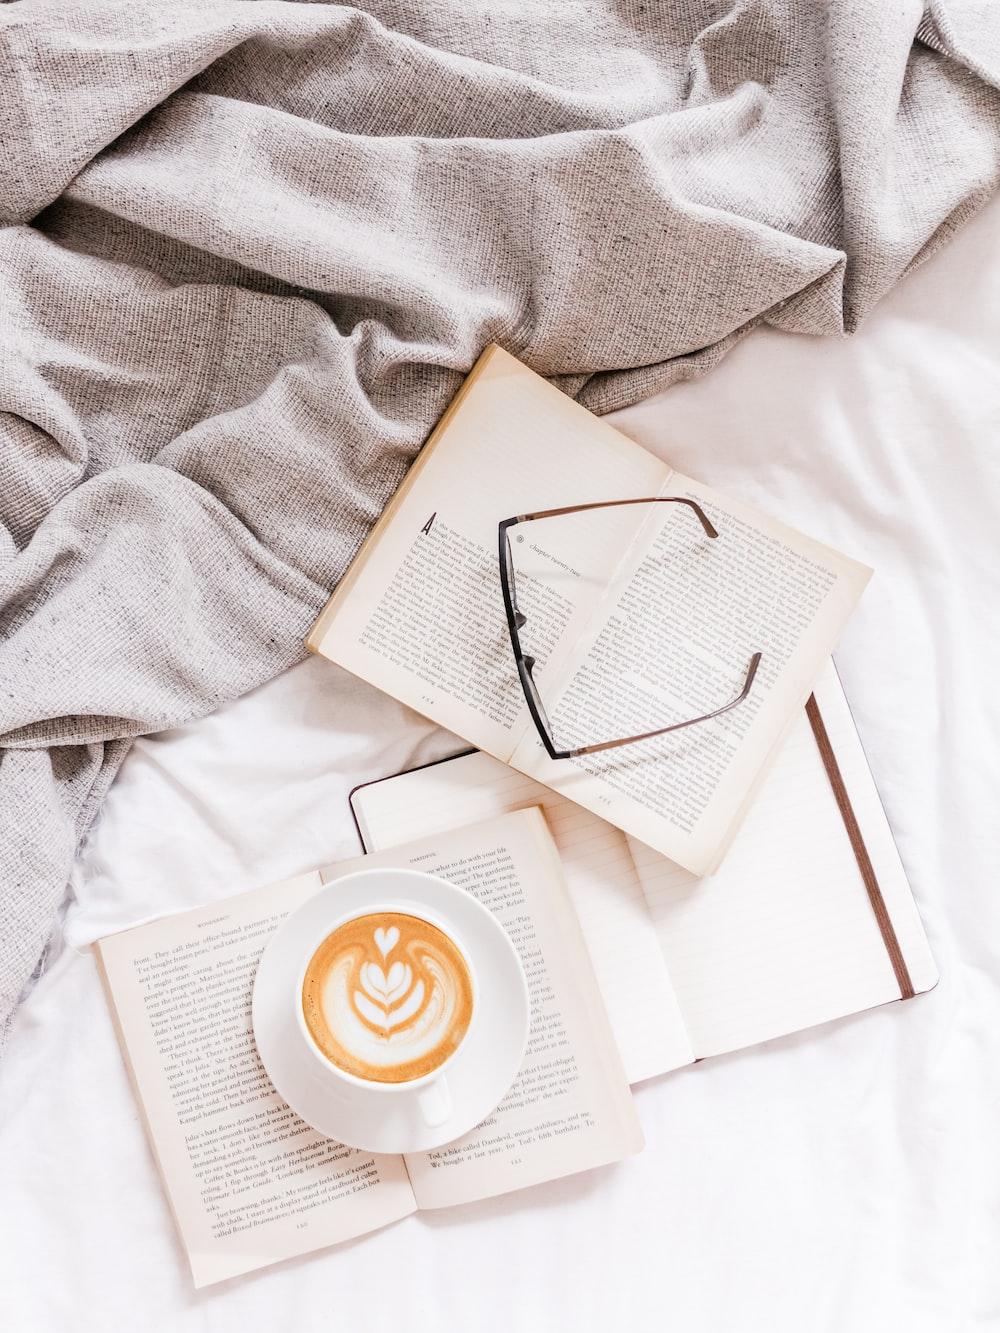 three opened books and eyeglasses on white textile